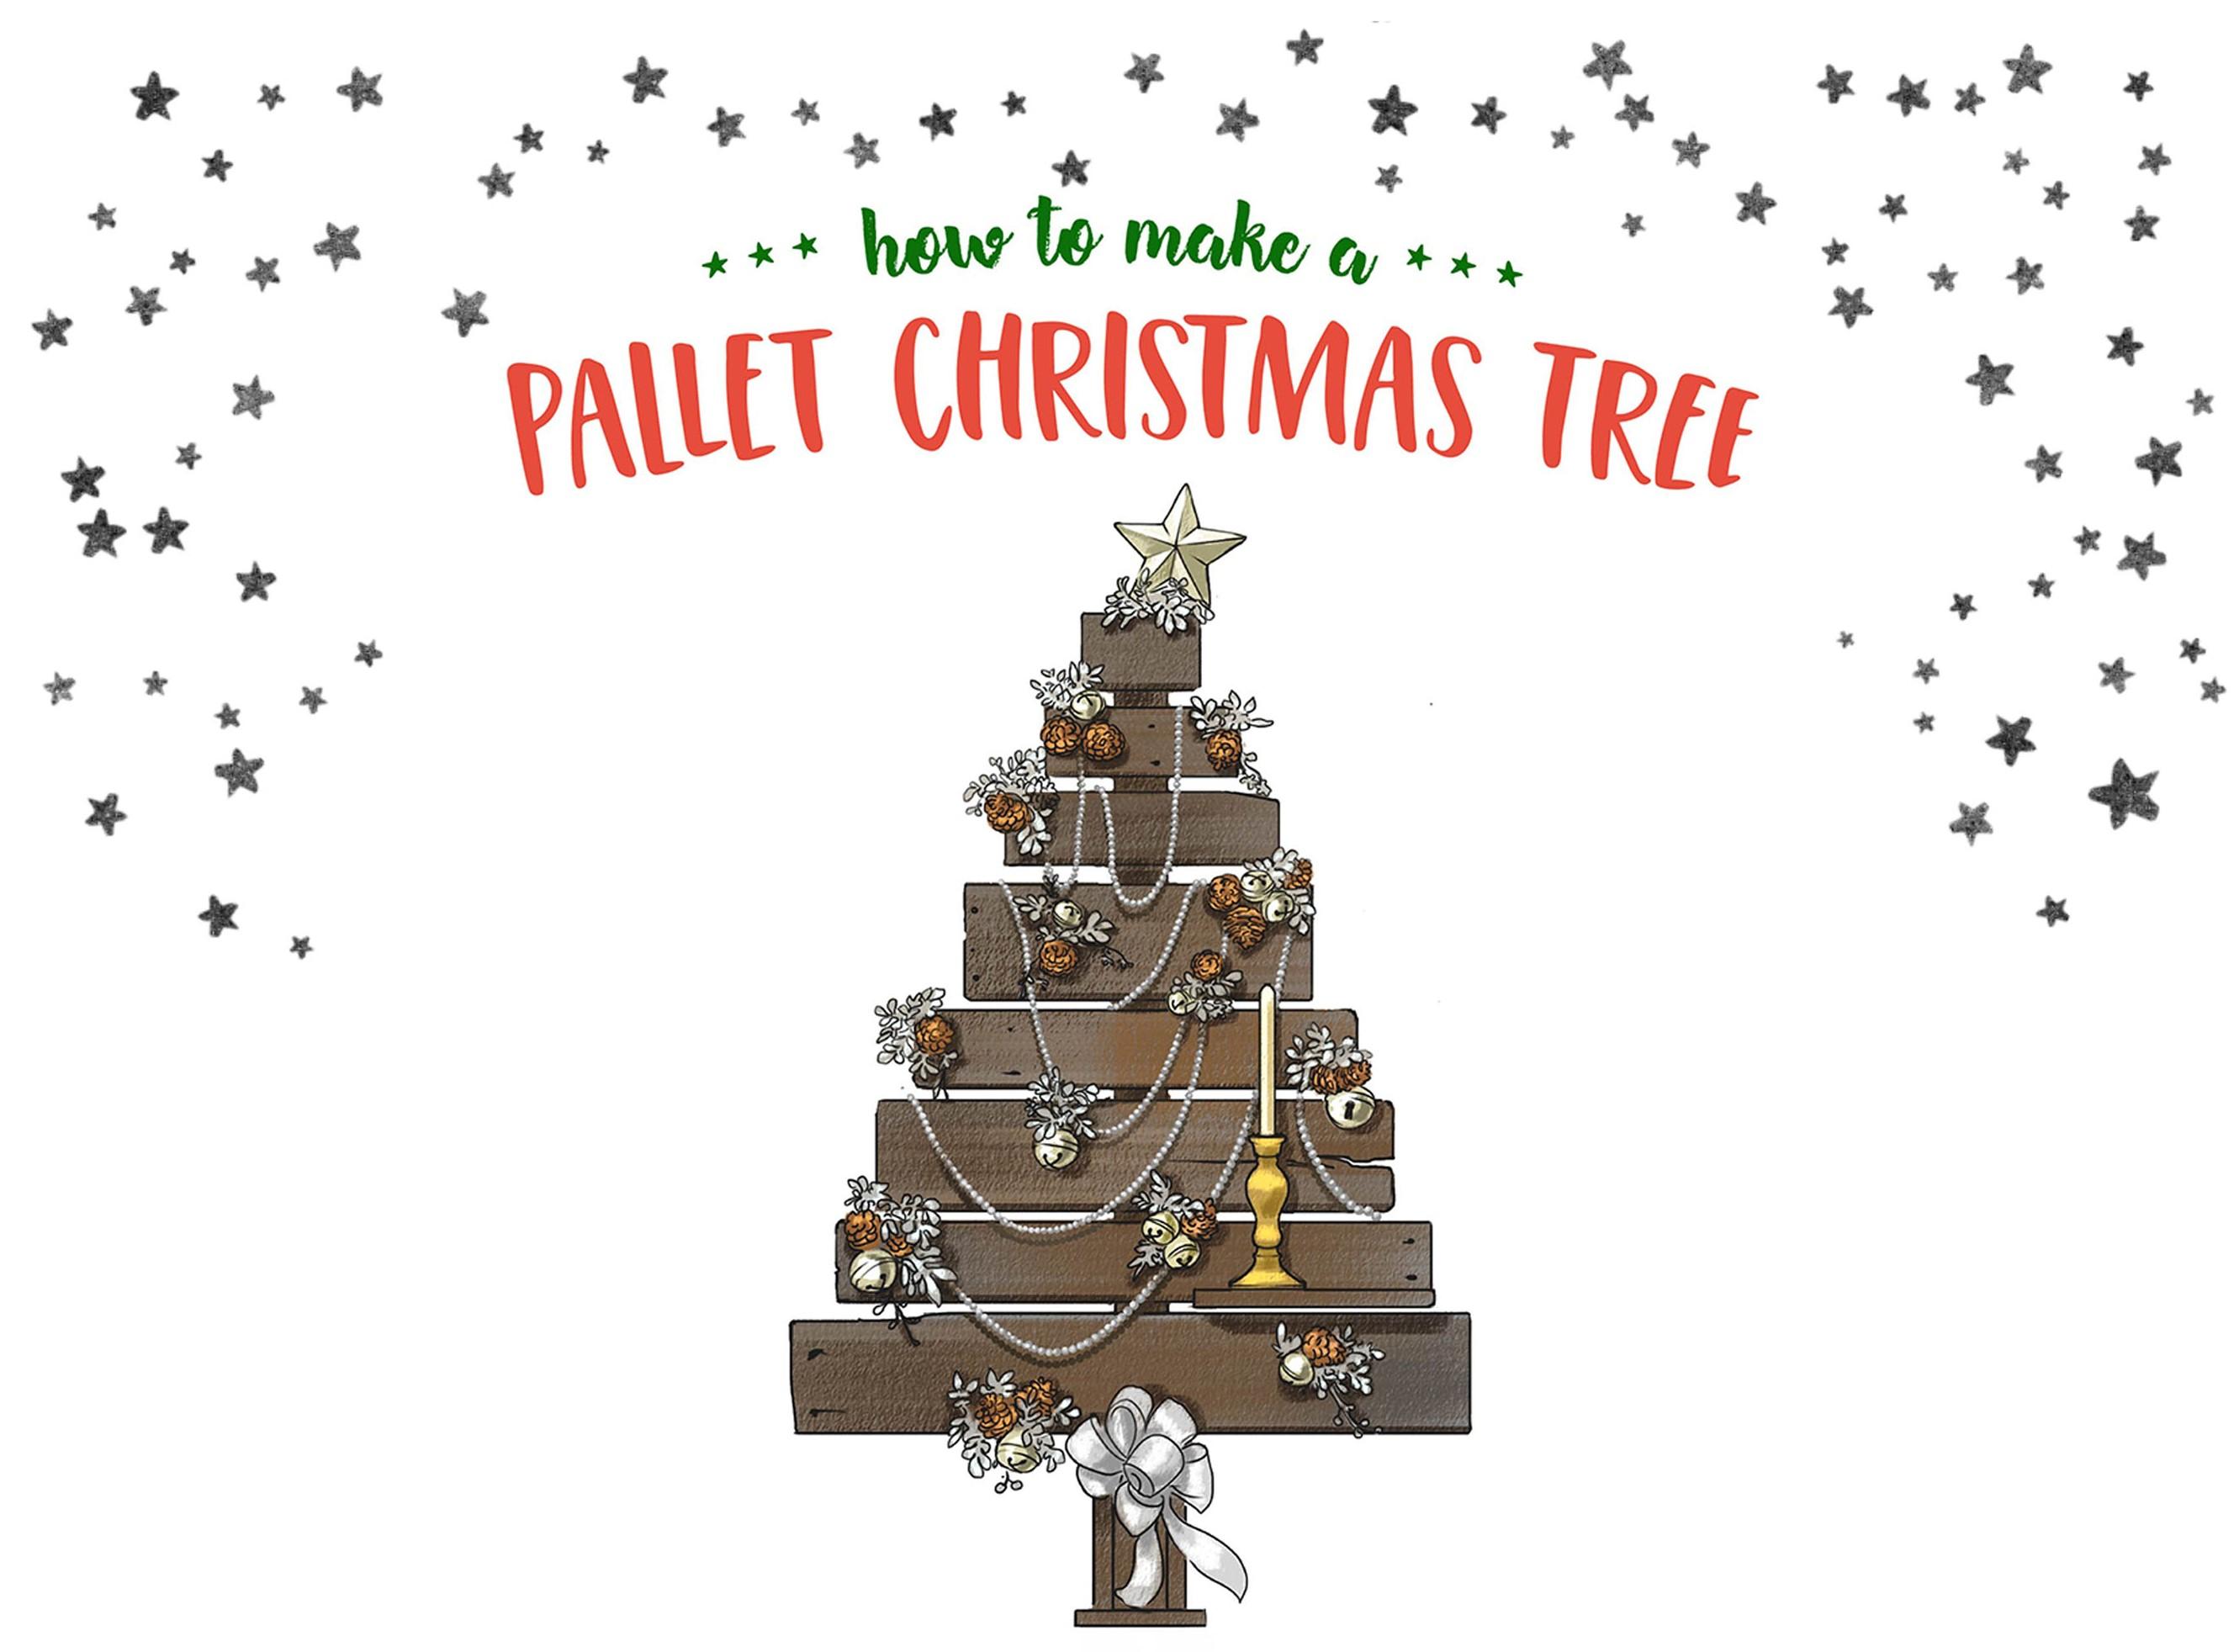 Pallet Christmas tree tutorial